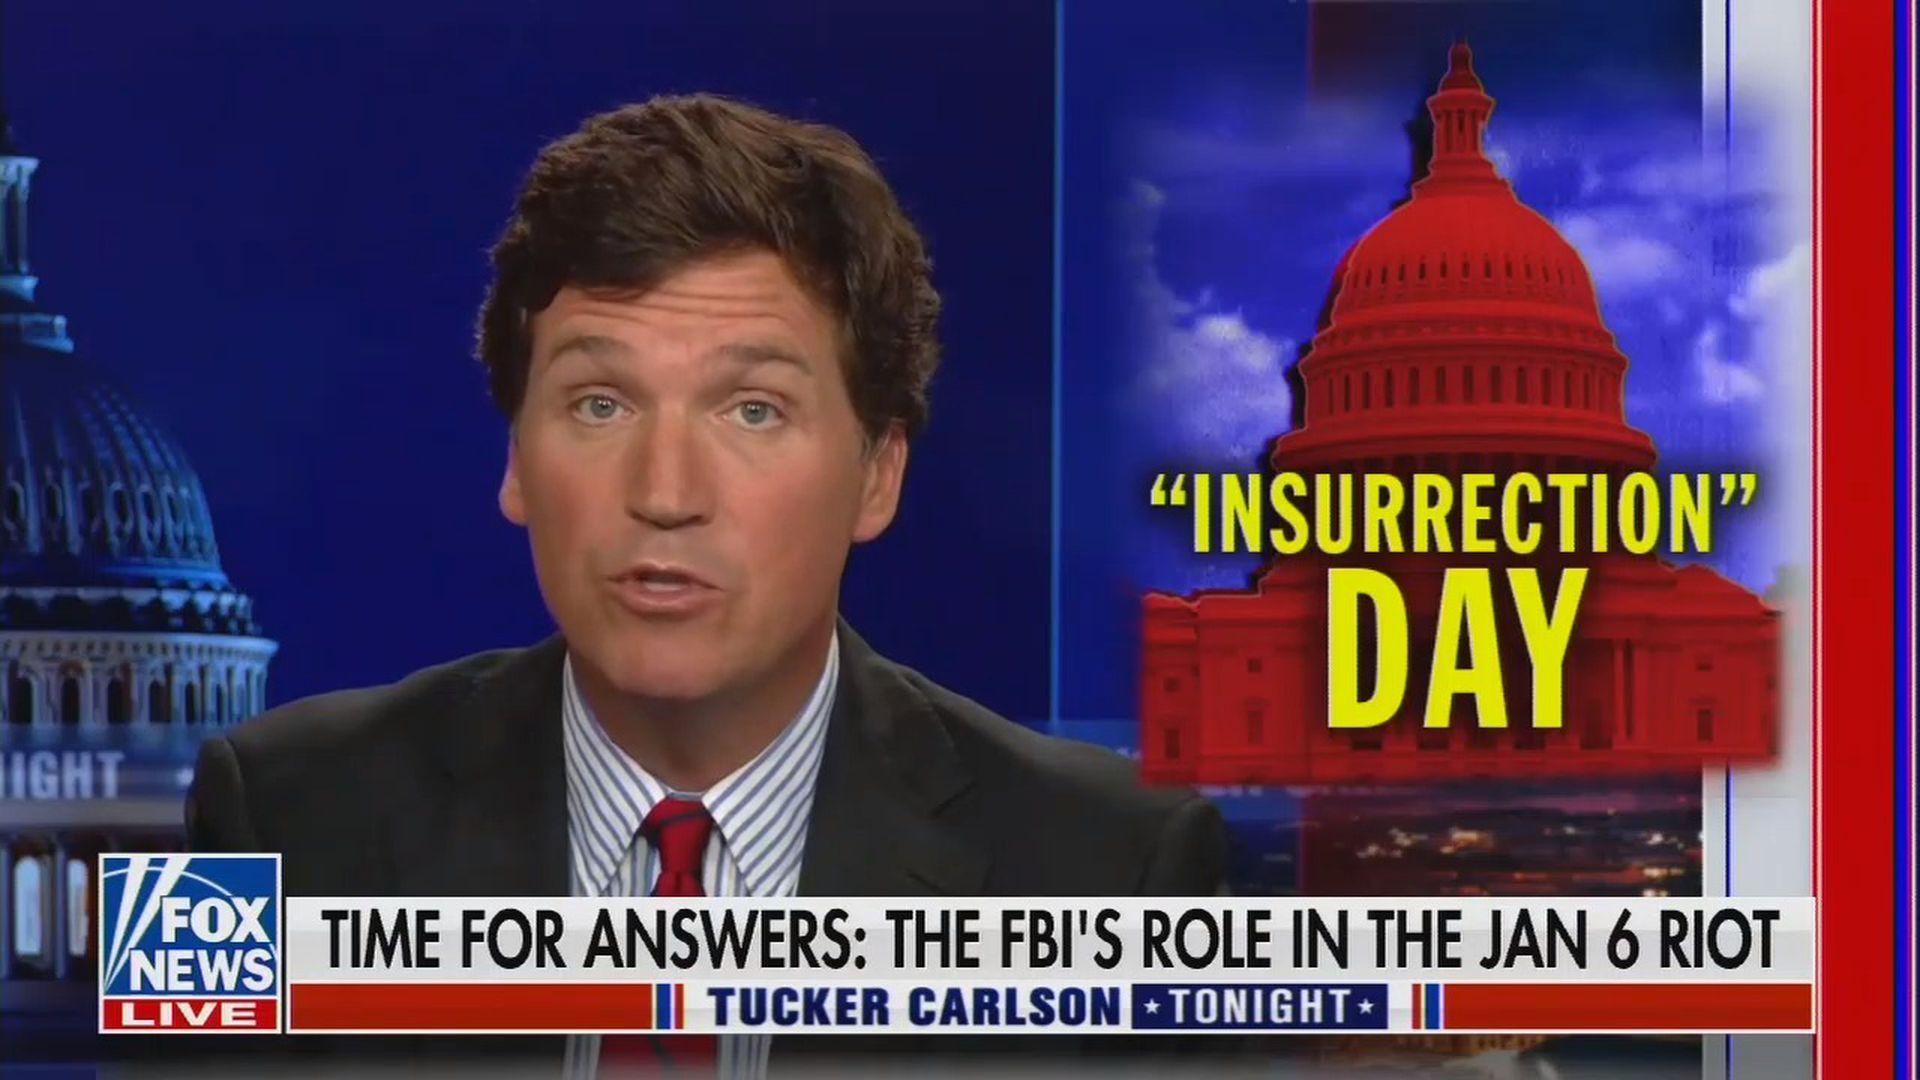 Tucker Carlson Says He Won't Run for President in 2024